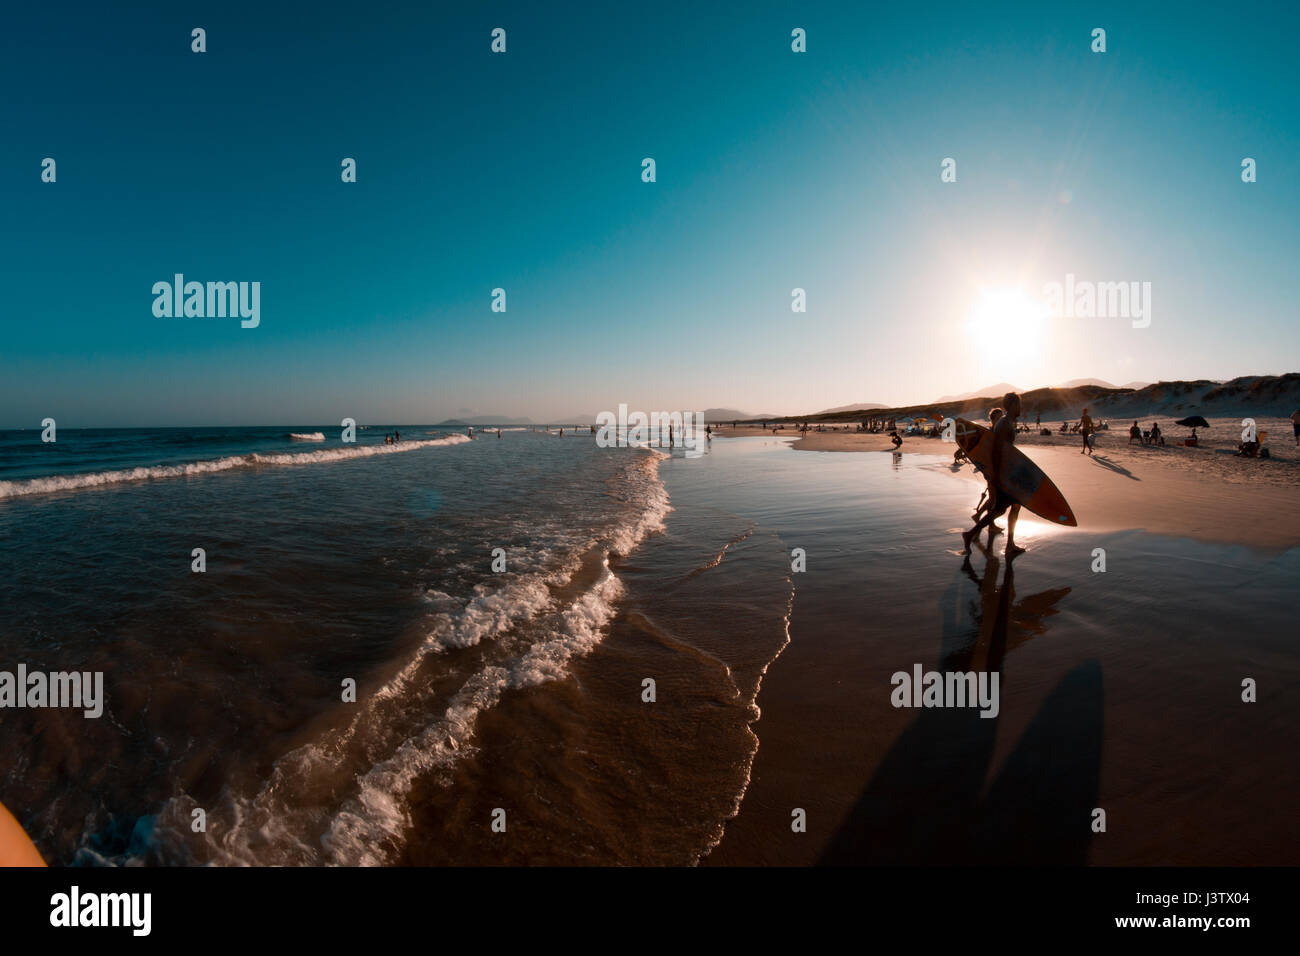 surfer at the beach of sao joaquim, florianopolis, brazil - Stock Image